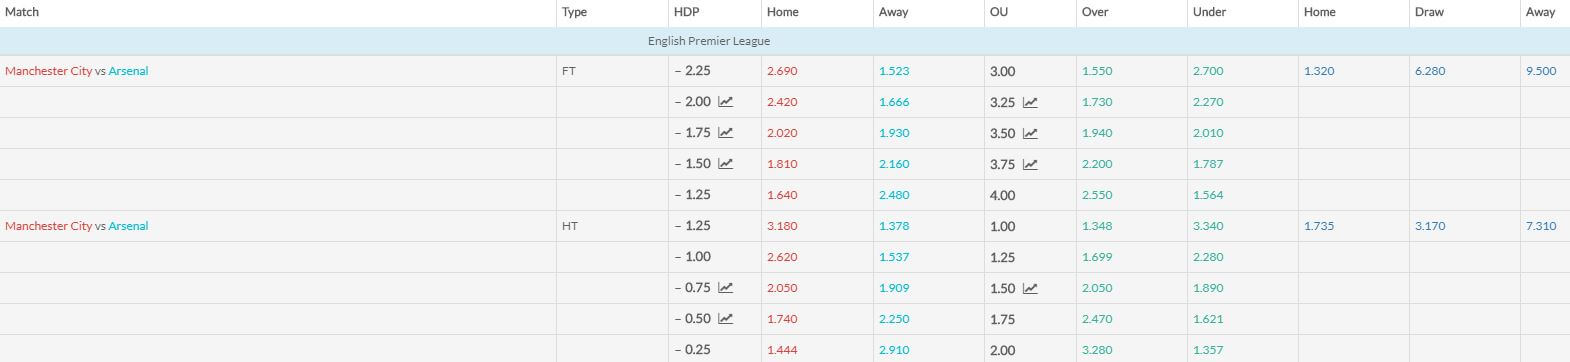 Manchester City v Arsenal match betting odds 030219